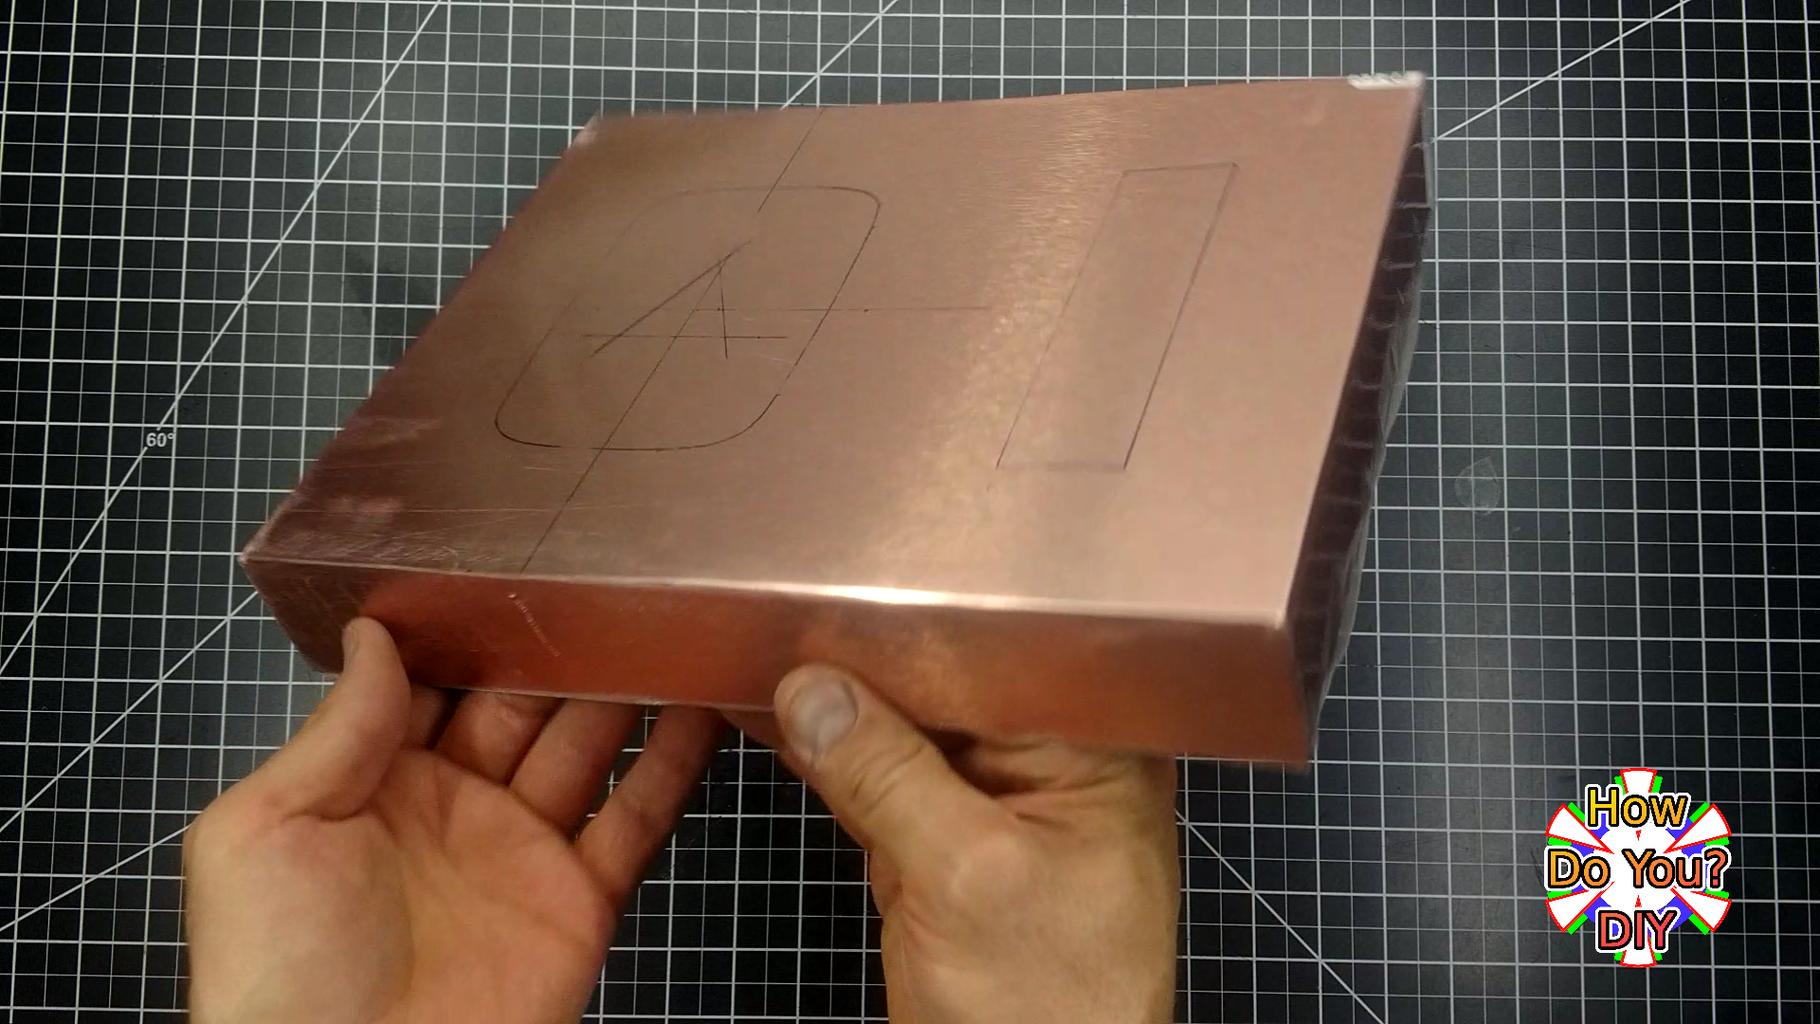 Shaping the Box